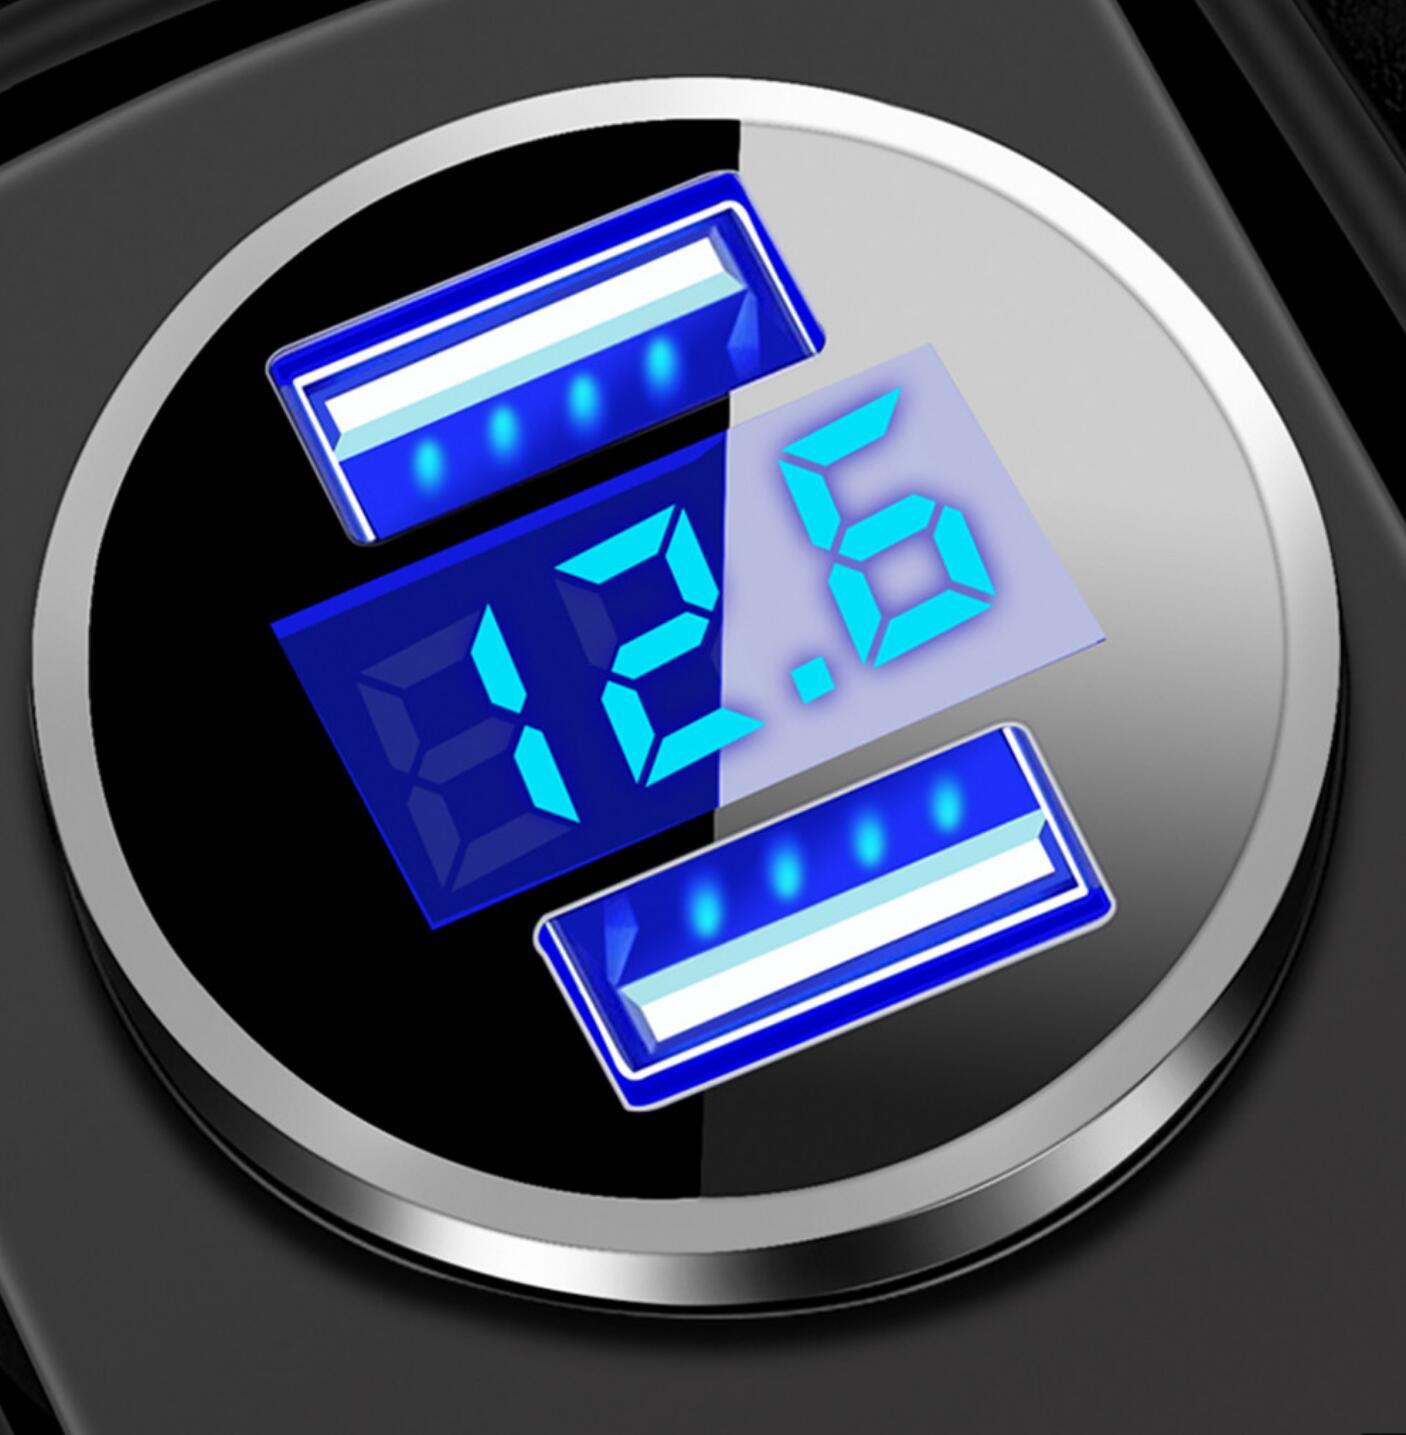 Dual port USB 3.1A car charger LED display for Opel Astra VAUXHALL MOKKA Zafira Insignia Vectra Antara